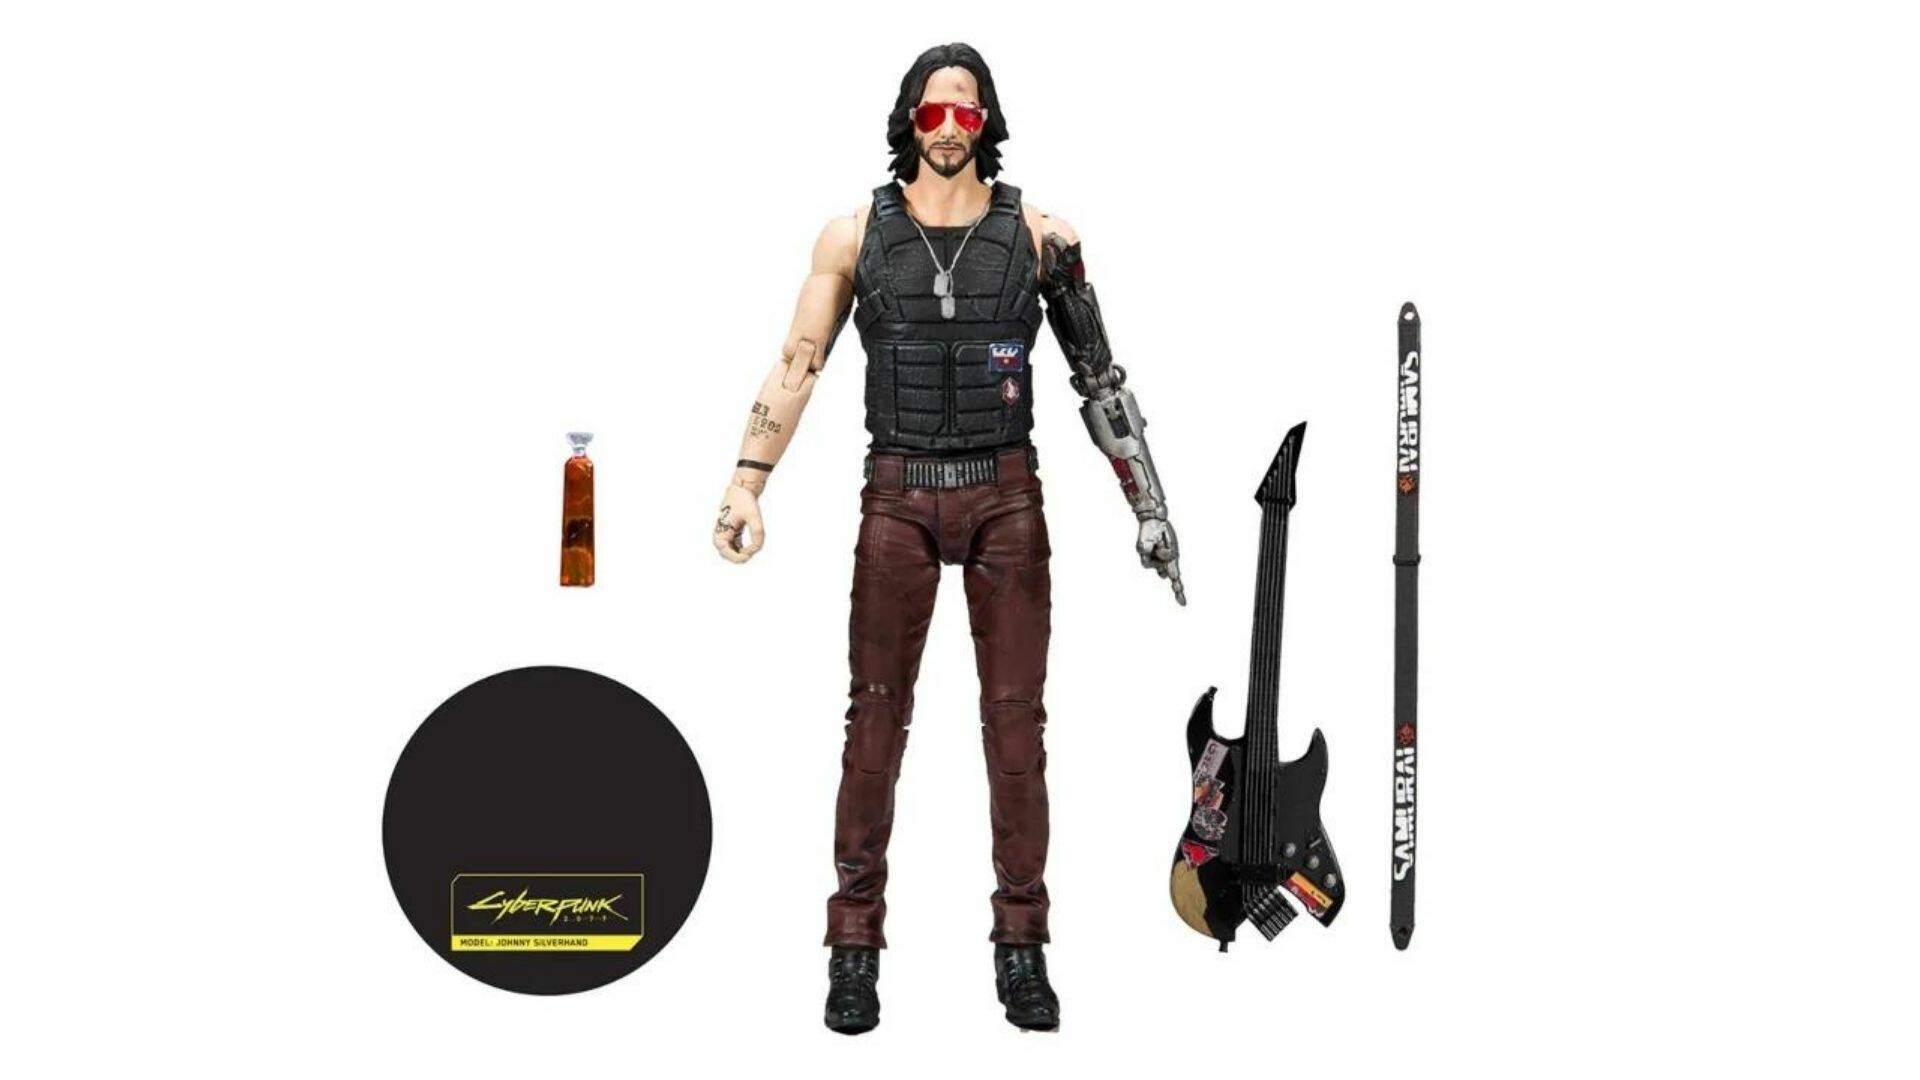 johnny silverhand action figure cyberpunk 2077